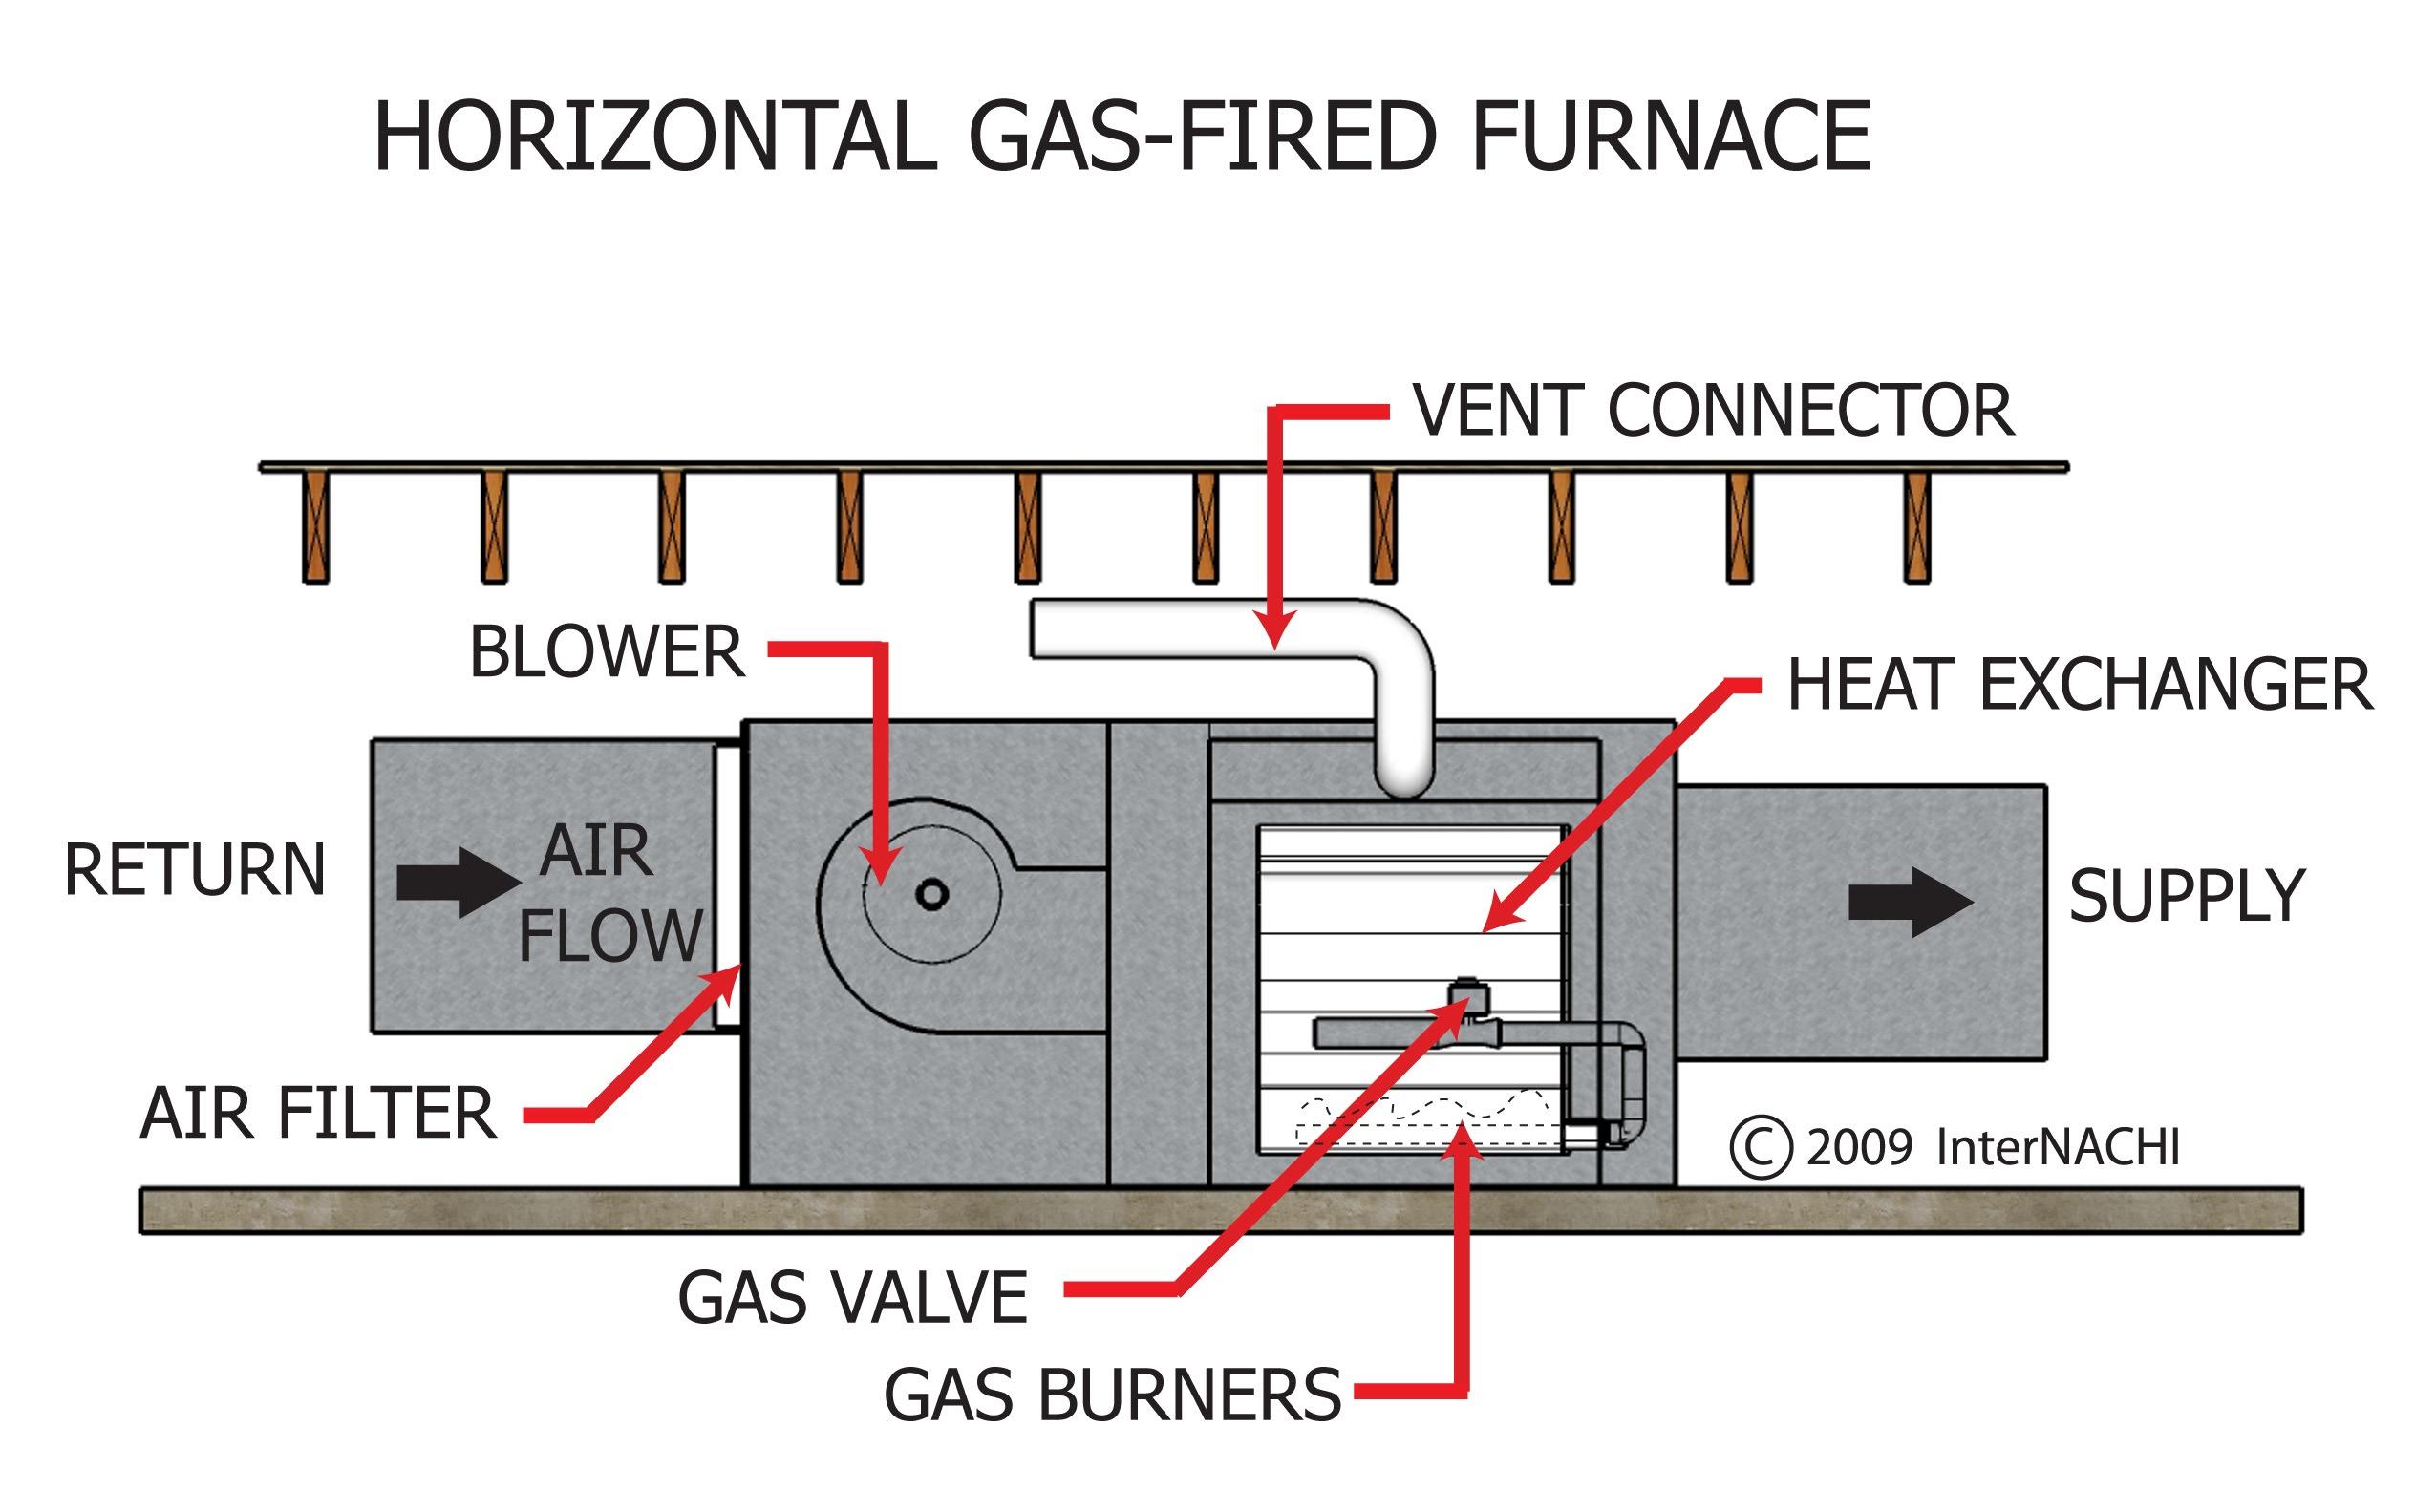 Rheem Horizontal Gas Furnace Older Wiring Diagram Old Diagrams York 2550x1583